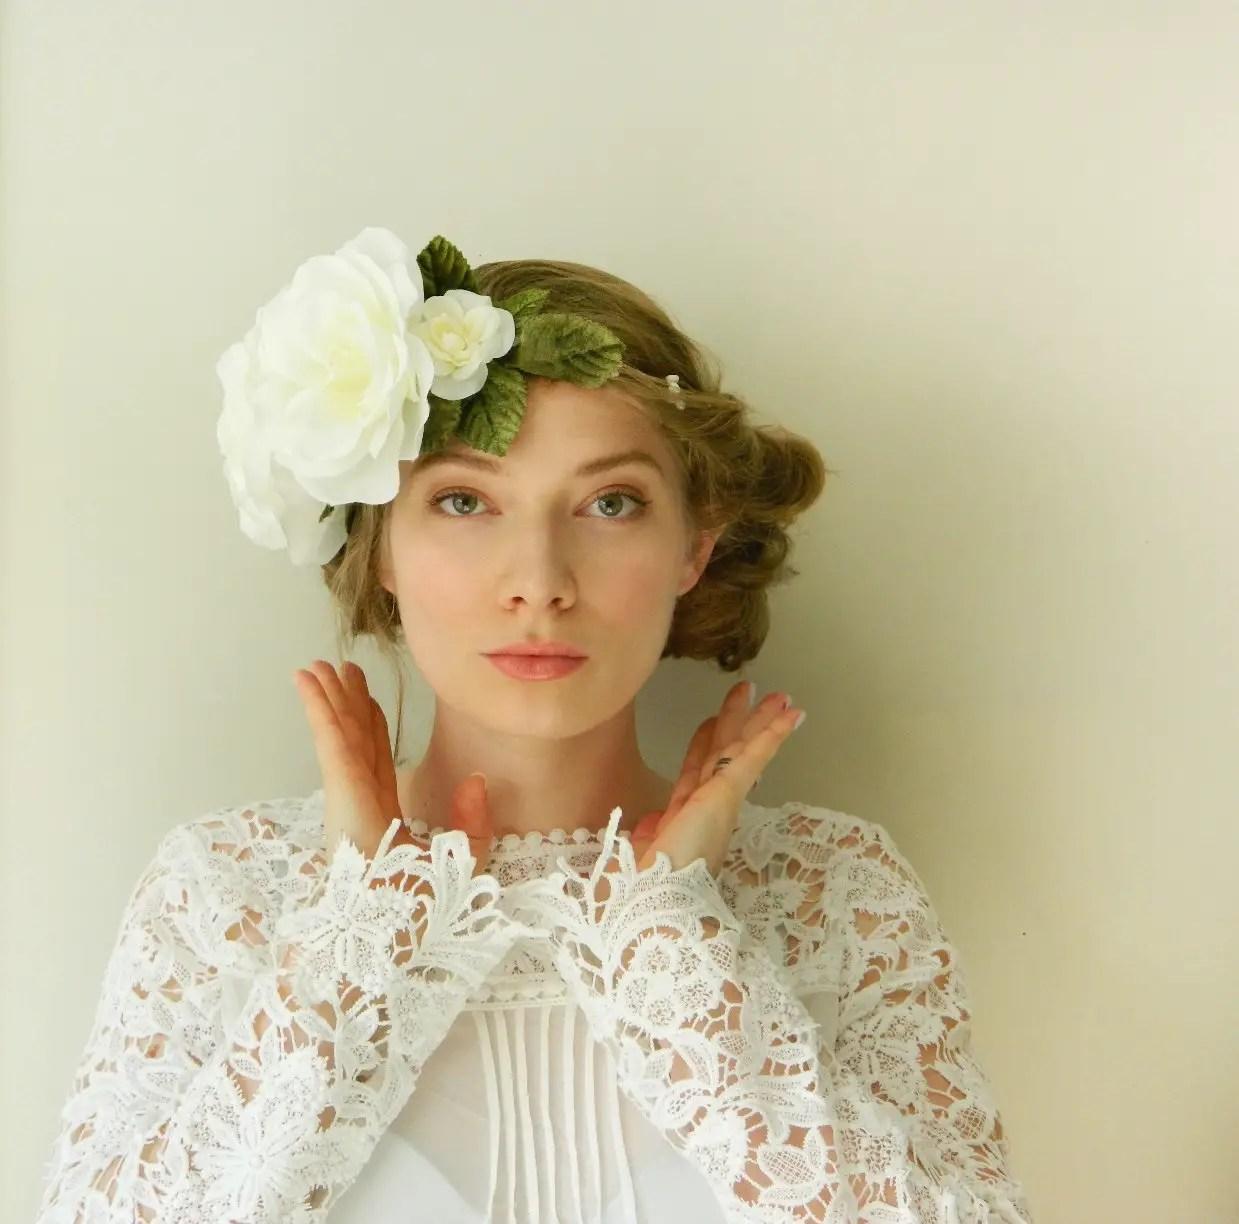 3 Easy Tips For Choosing A Wedding Hair Crown